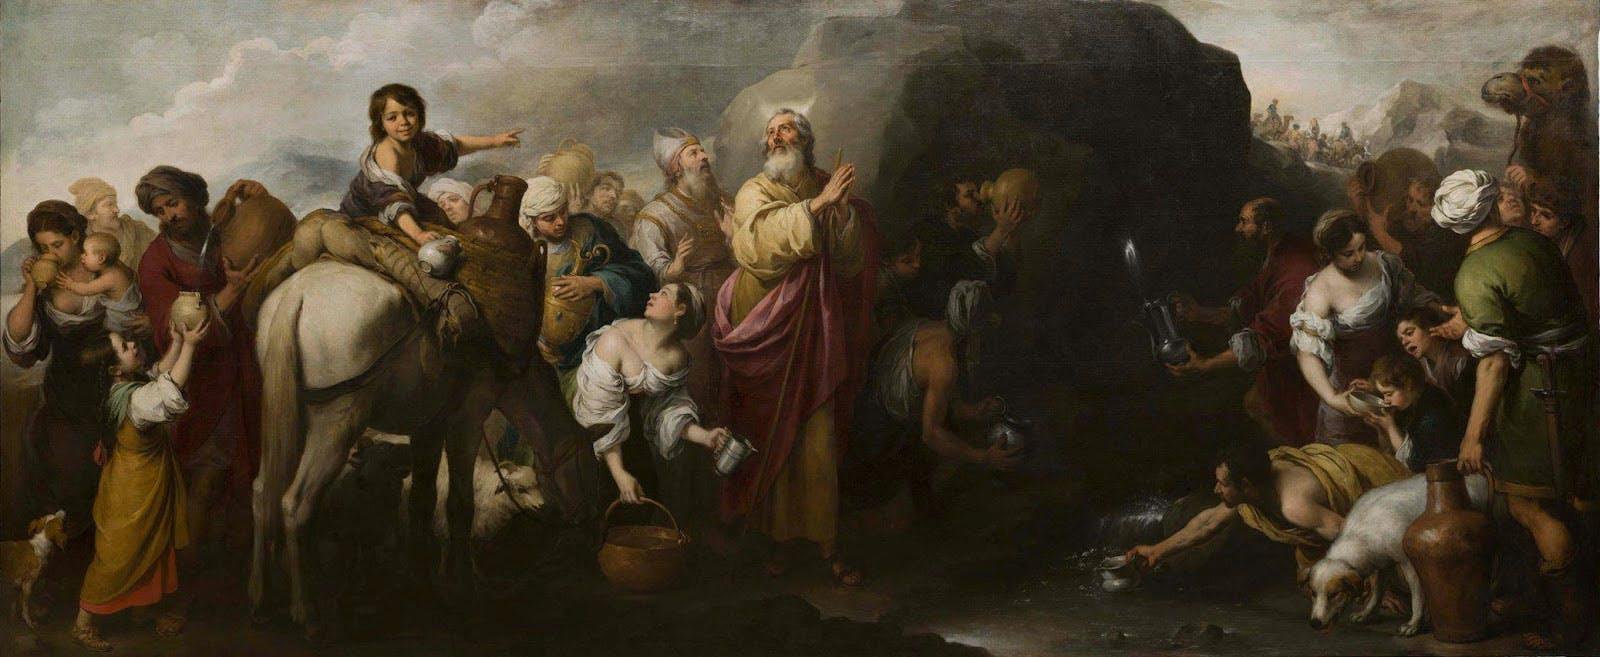 Moses Striking the Rock (1670–74), Bartolomé Esteban Murillo. Hospital de la Caridad